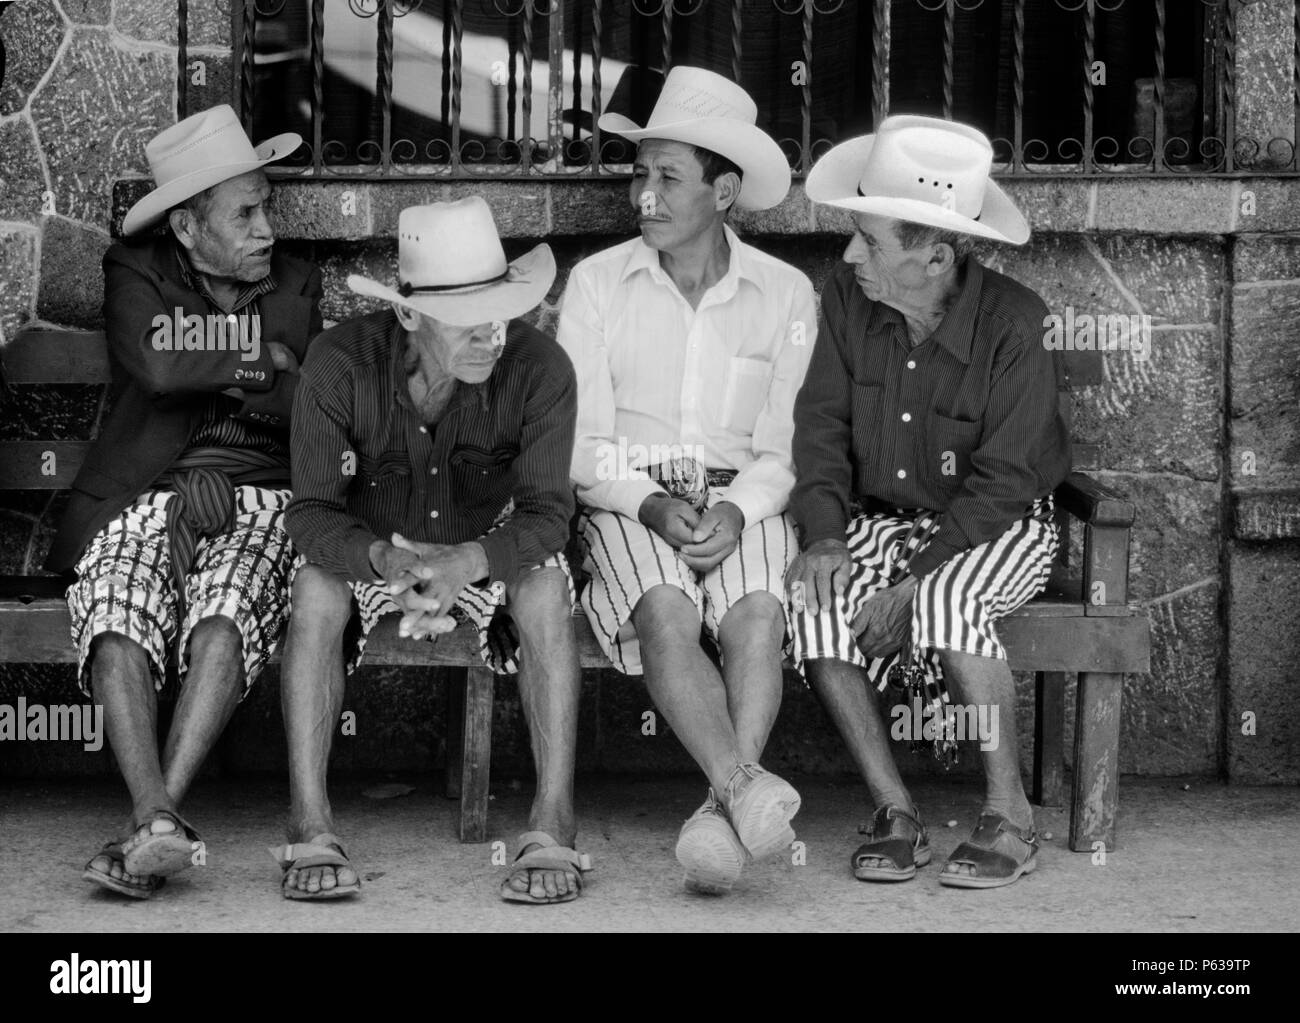 TZUTUJIL MEN in traditional dress with COWBOY HATS - SANTIAGO ATITLAN, GUATEMALA Stock Photo